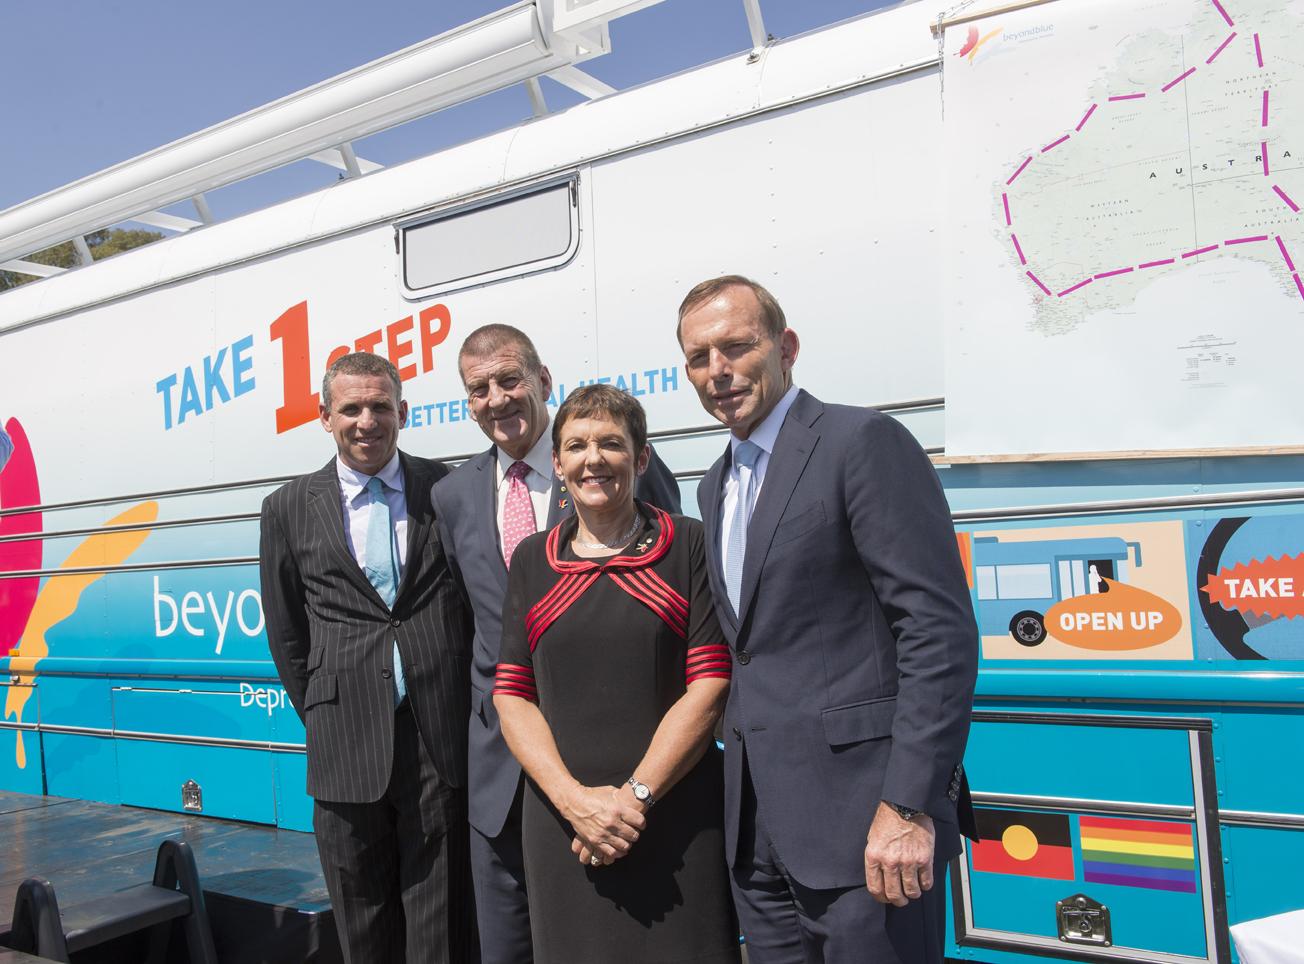 Dr Matthew Cullen of Medibank Health Solutions, Jeff Kennett, Kate Carnell and Prime Minister Tony Abbott.